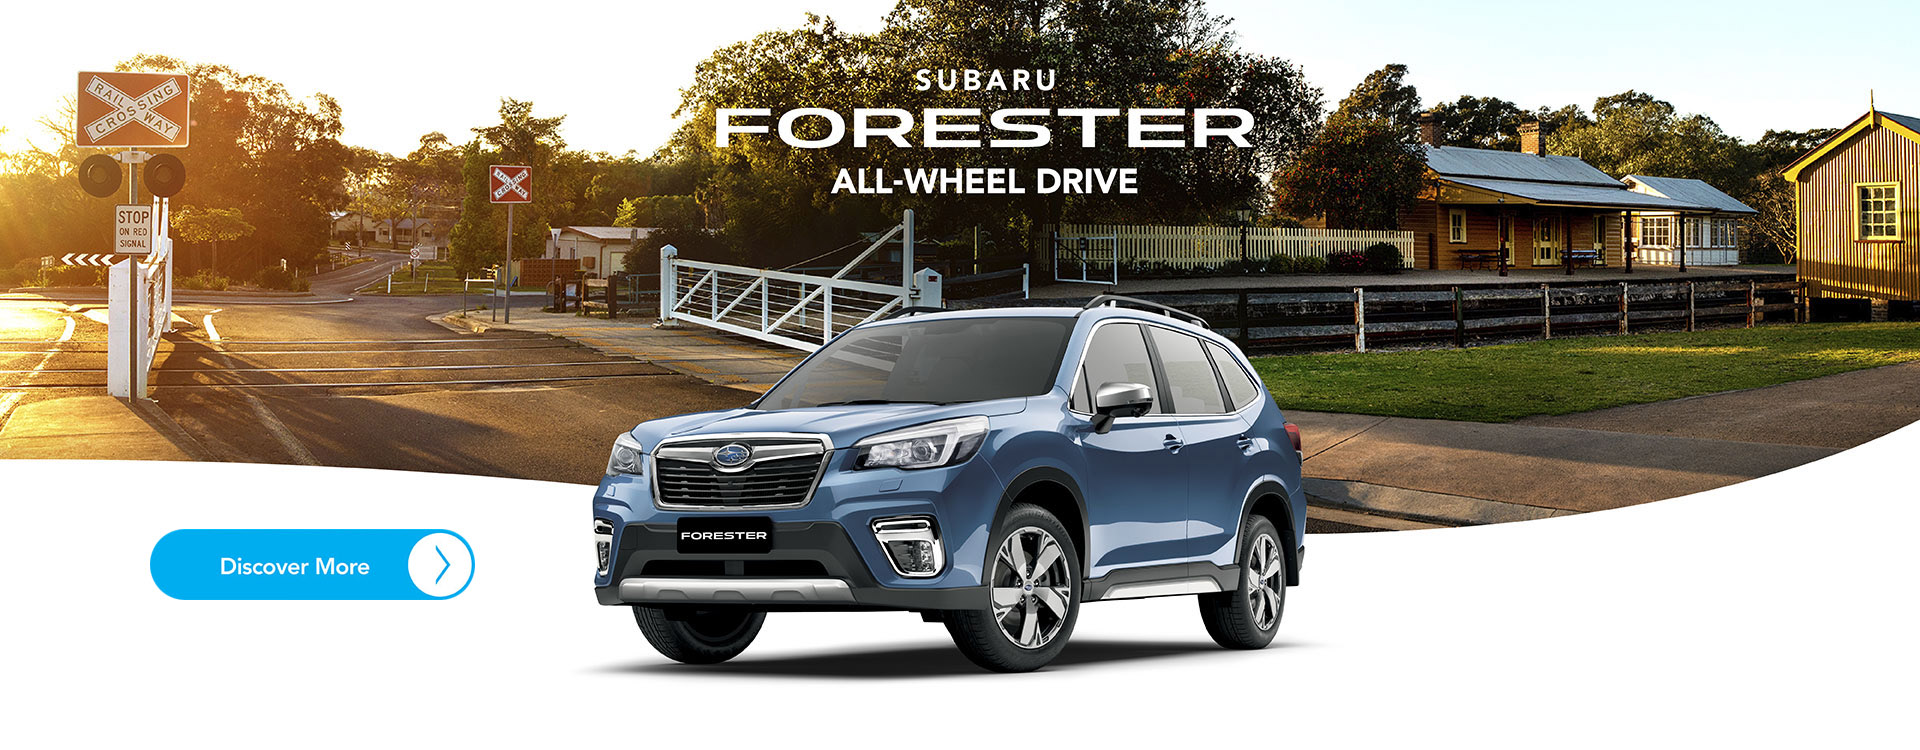 New Subaru Forester, including Hybrid e-Boxer, now available at Cricks Subaru, Sunshine Coast. Test Drive Today!